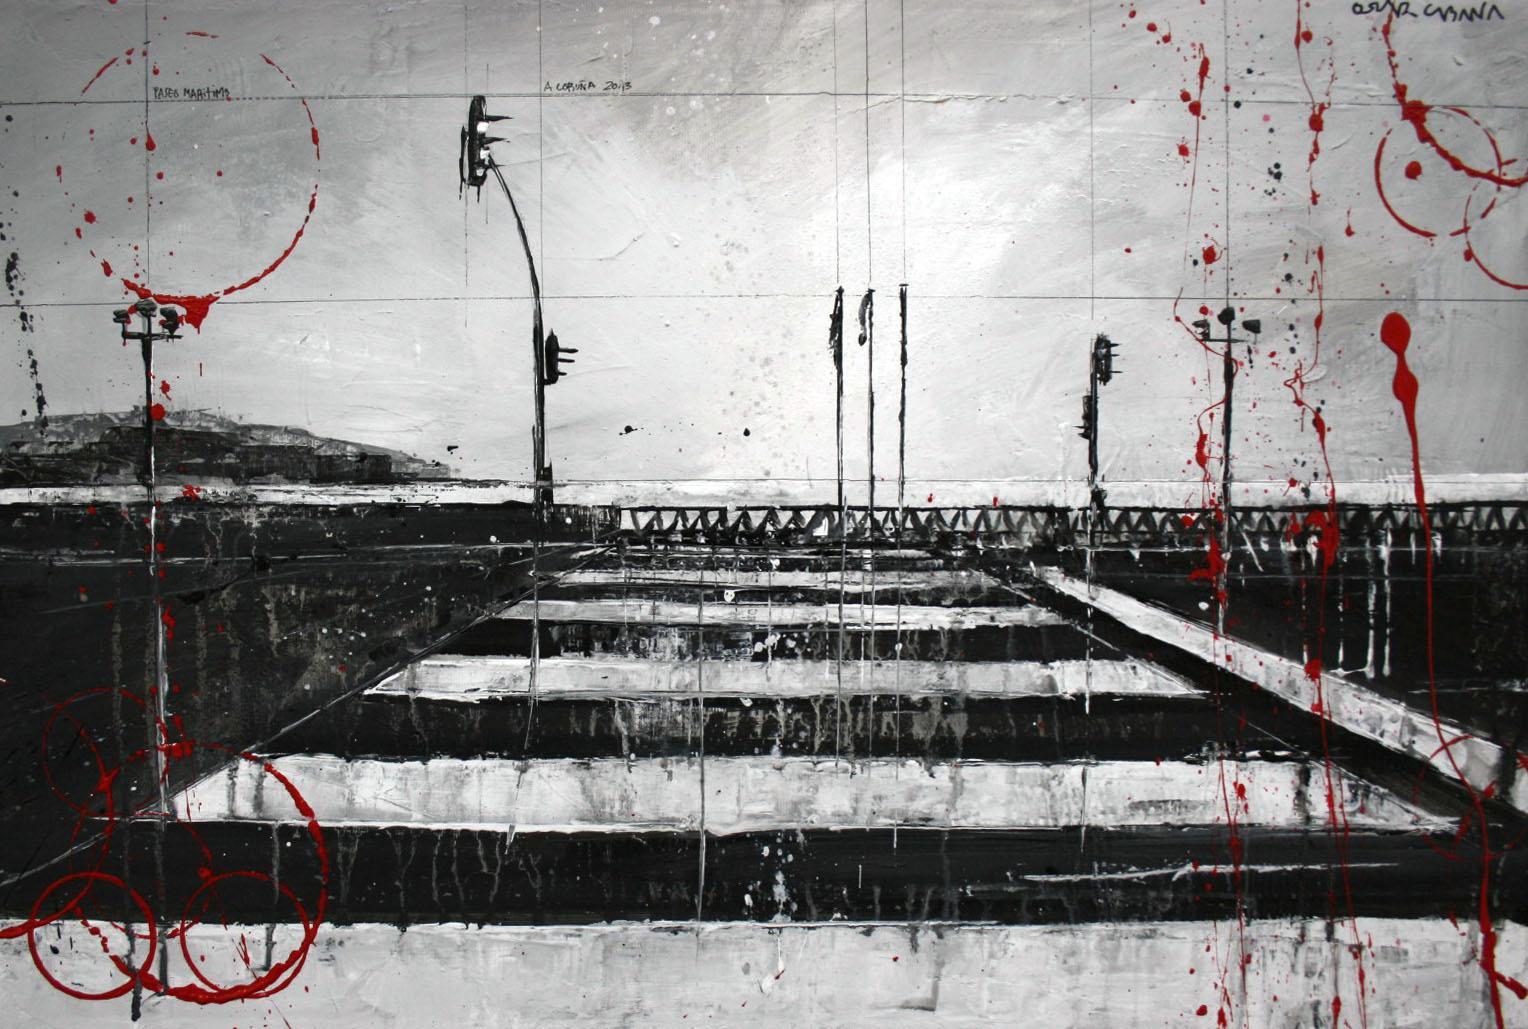 723_paso de cebra_60x40cm_mixed on canvas